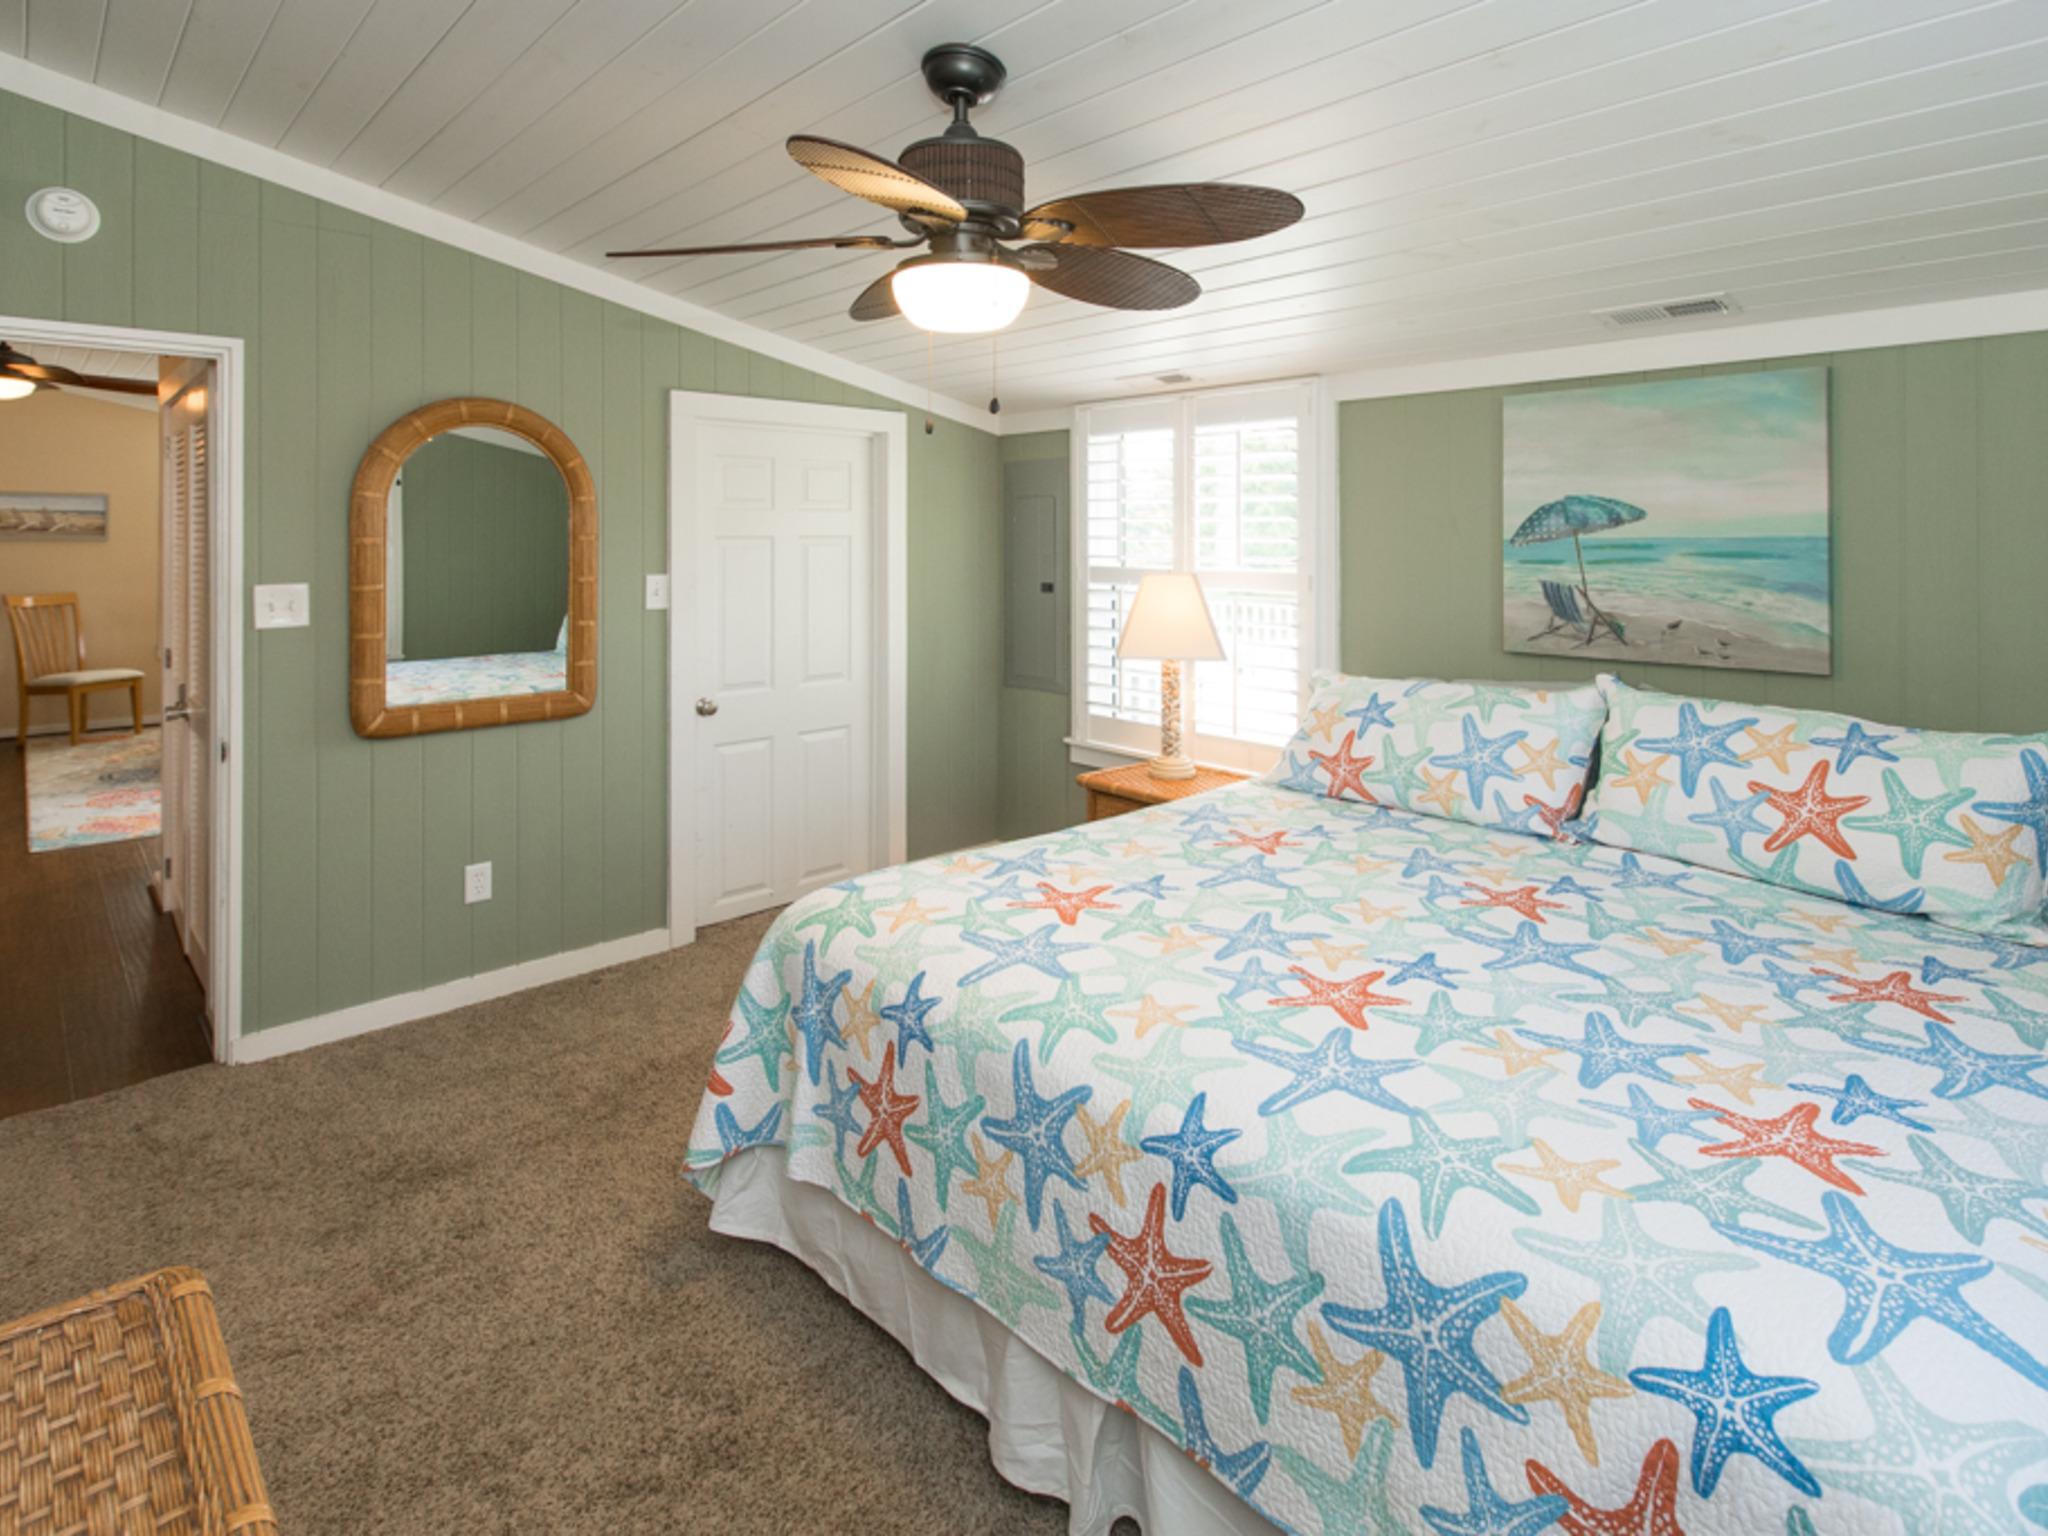 Atlantic pearl 4 bedroom home virginia beach va - 4 bedroom houses for rent in virginia beach ...